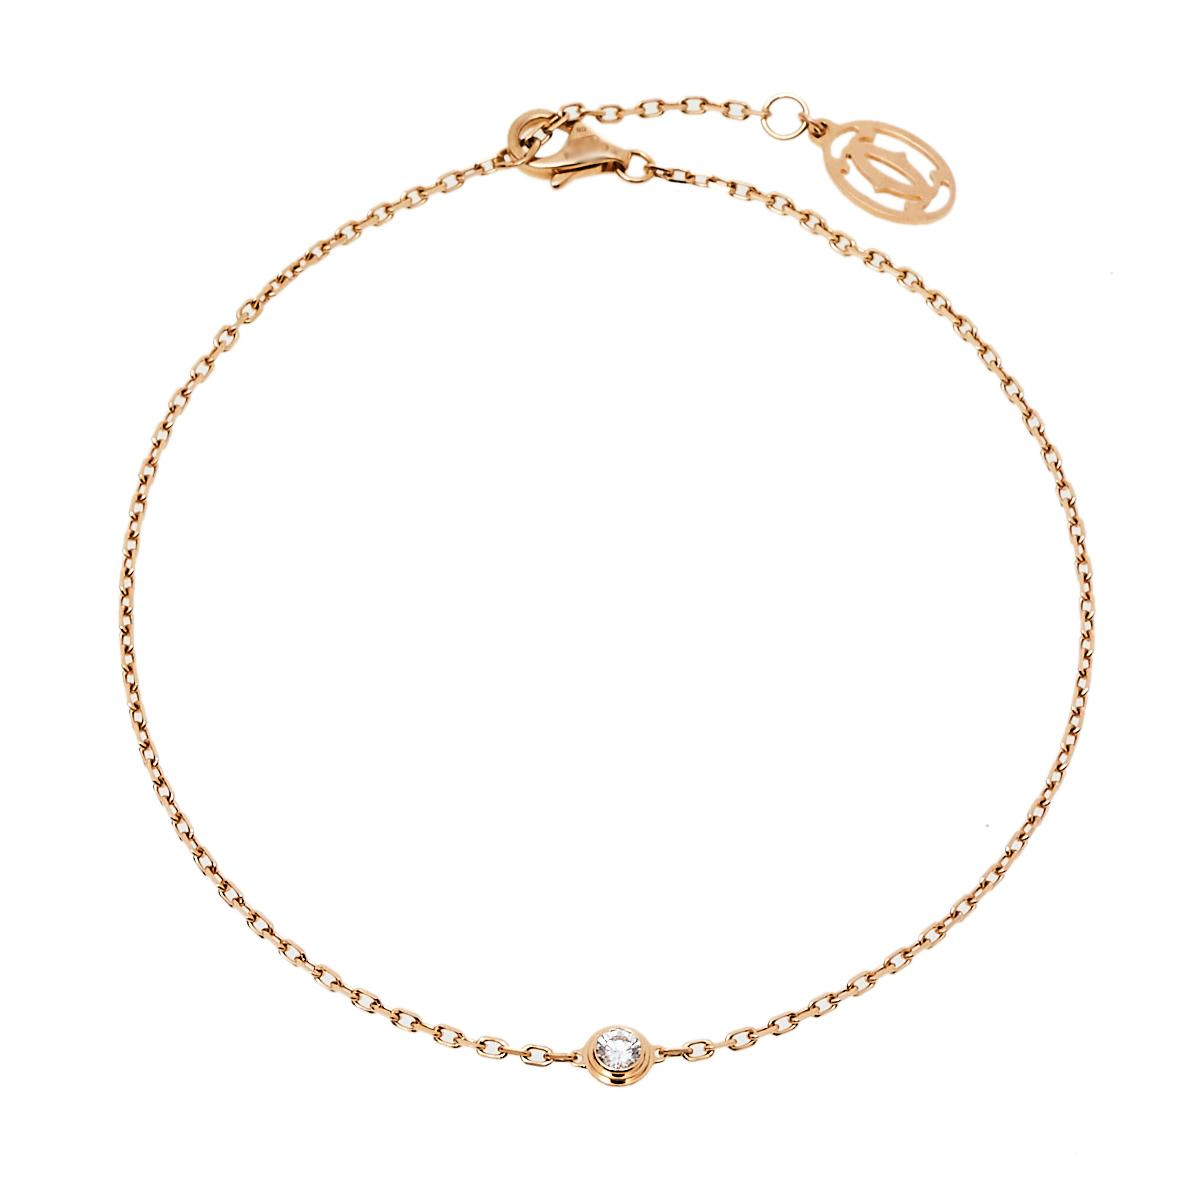 Pre-owned Cartier Diamond 18k Rose Gold Bracelet Sm